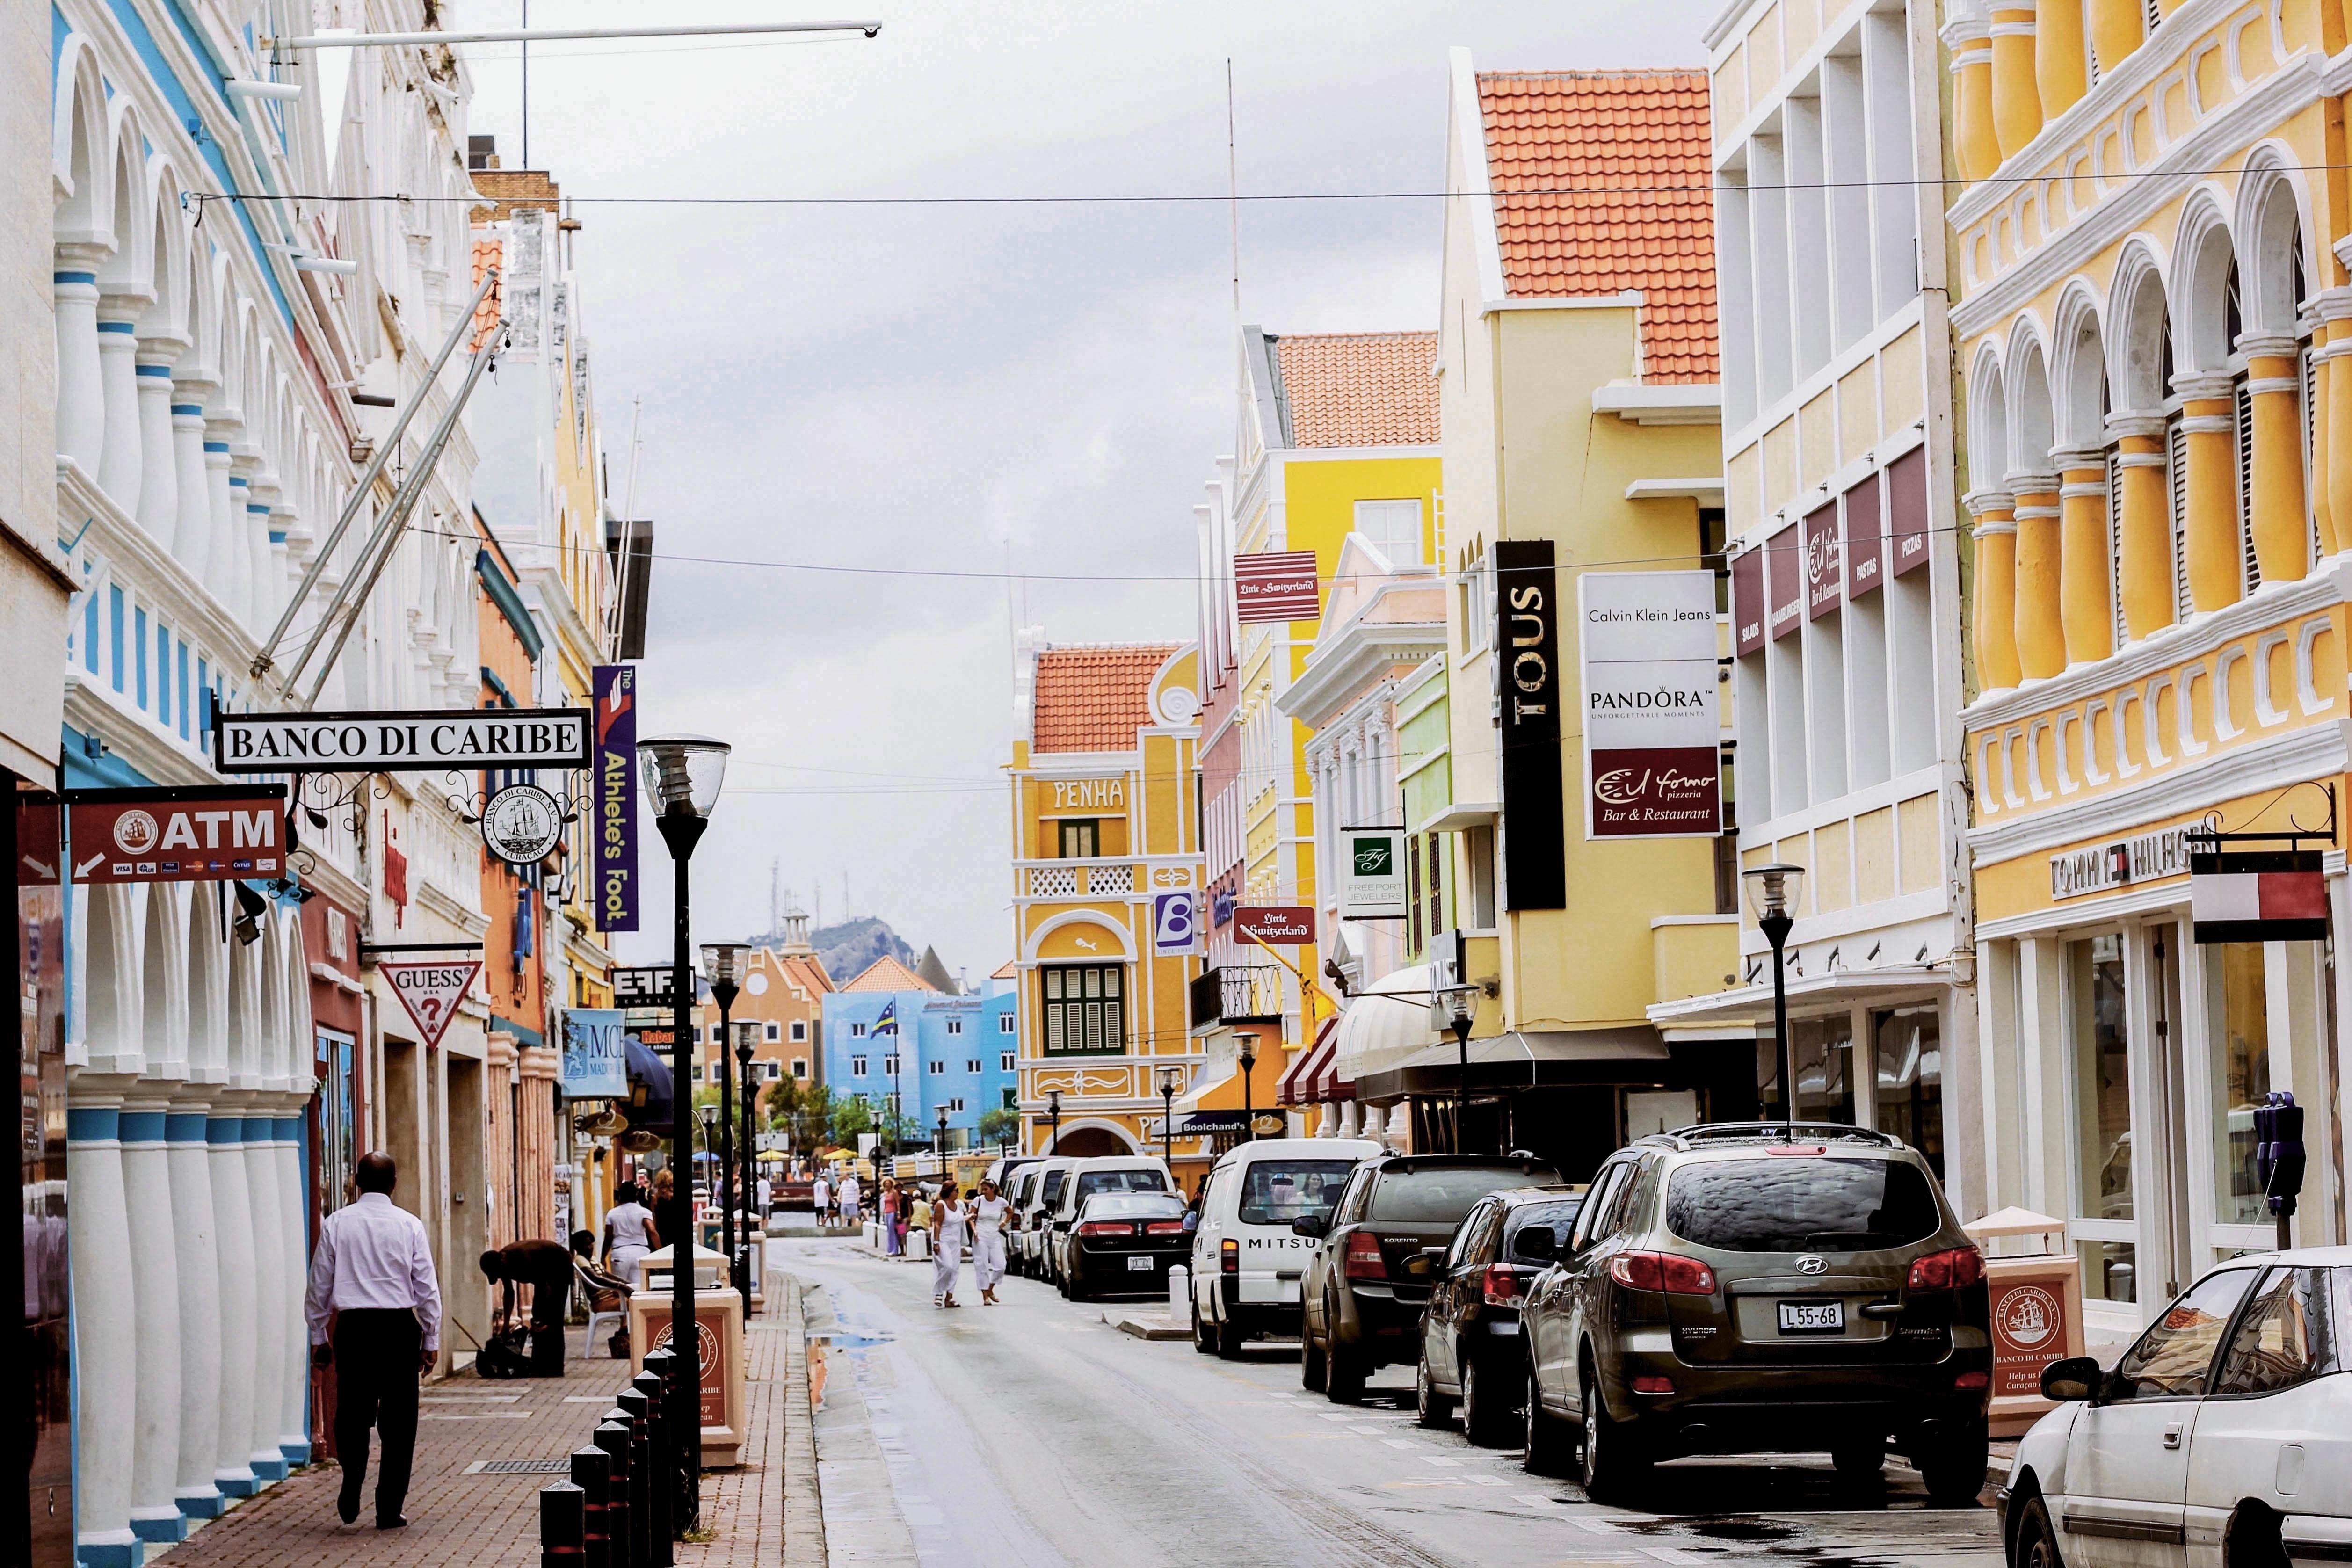 Road Curaçao Photo by Lakeisha Bennett